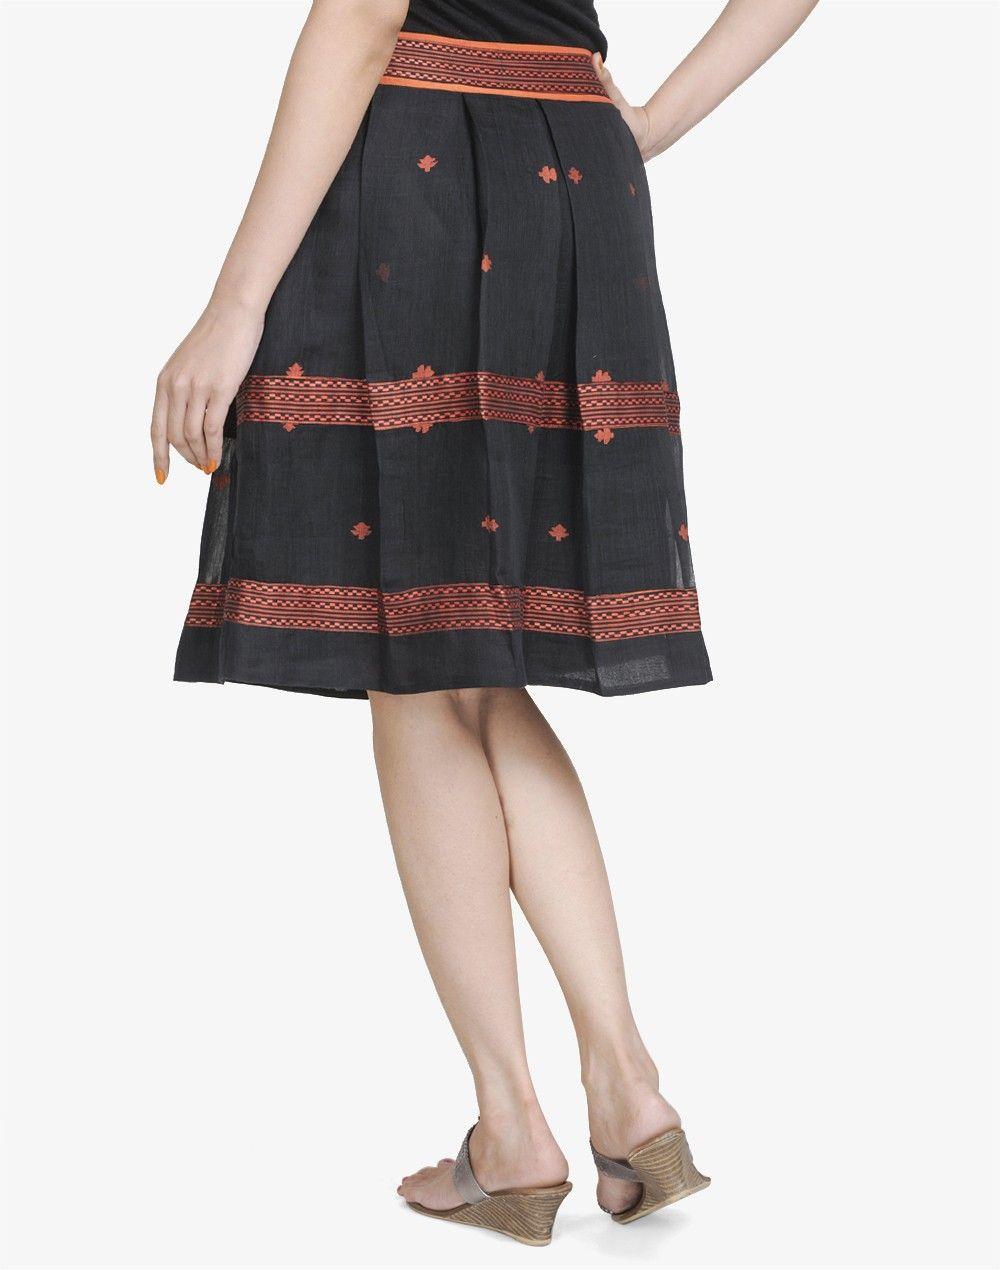 Only Twist Skirt Women Hot Sale Online Original For Cheap Latest Sale Online 4yjTi5p